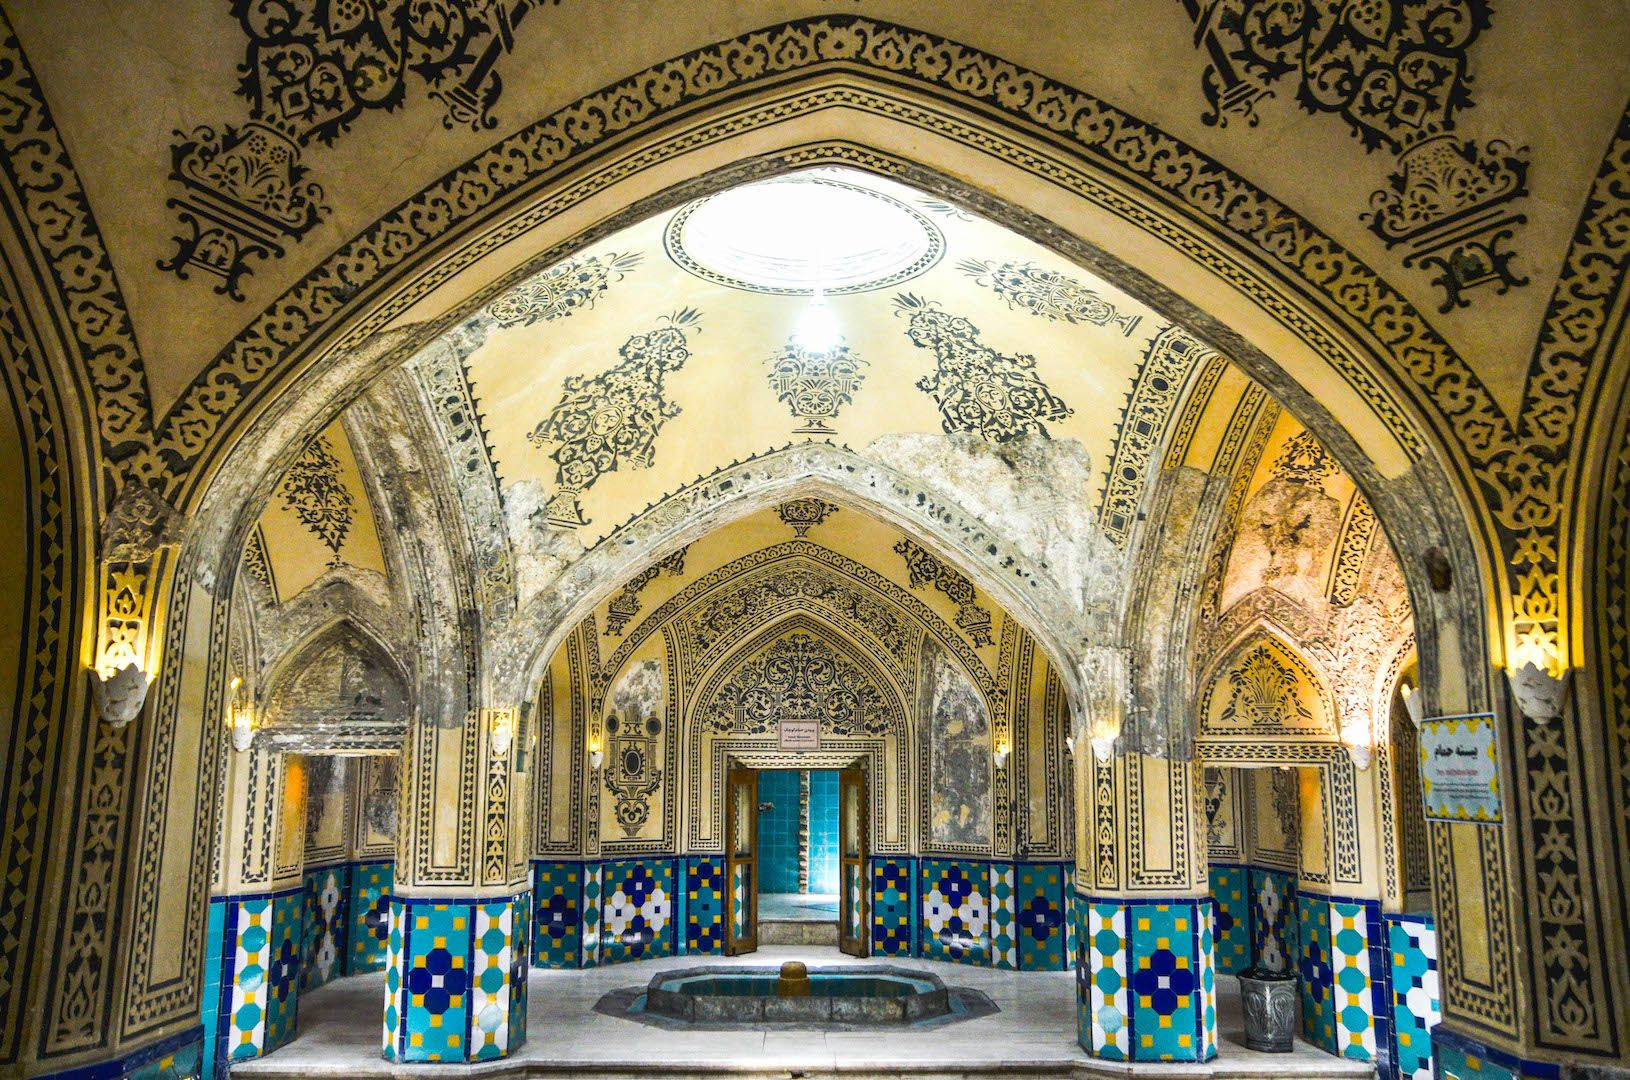 Stunning photographs of Iran